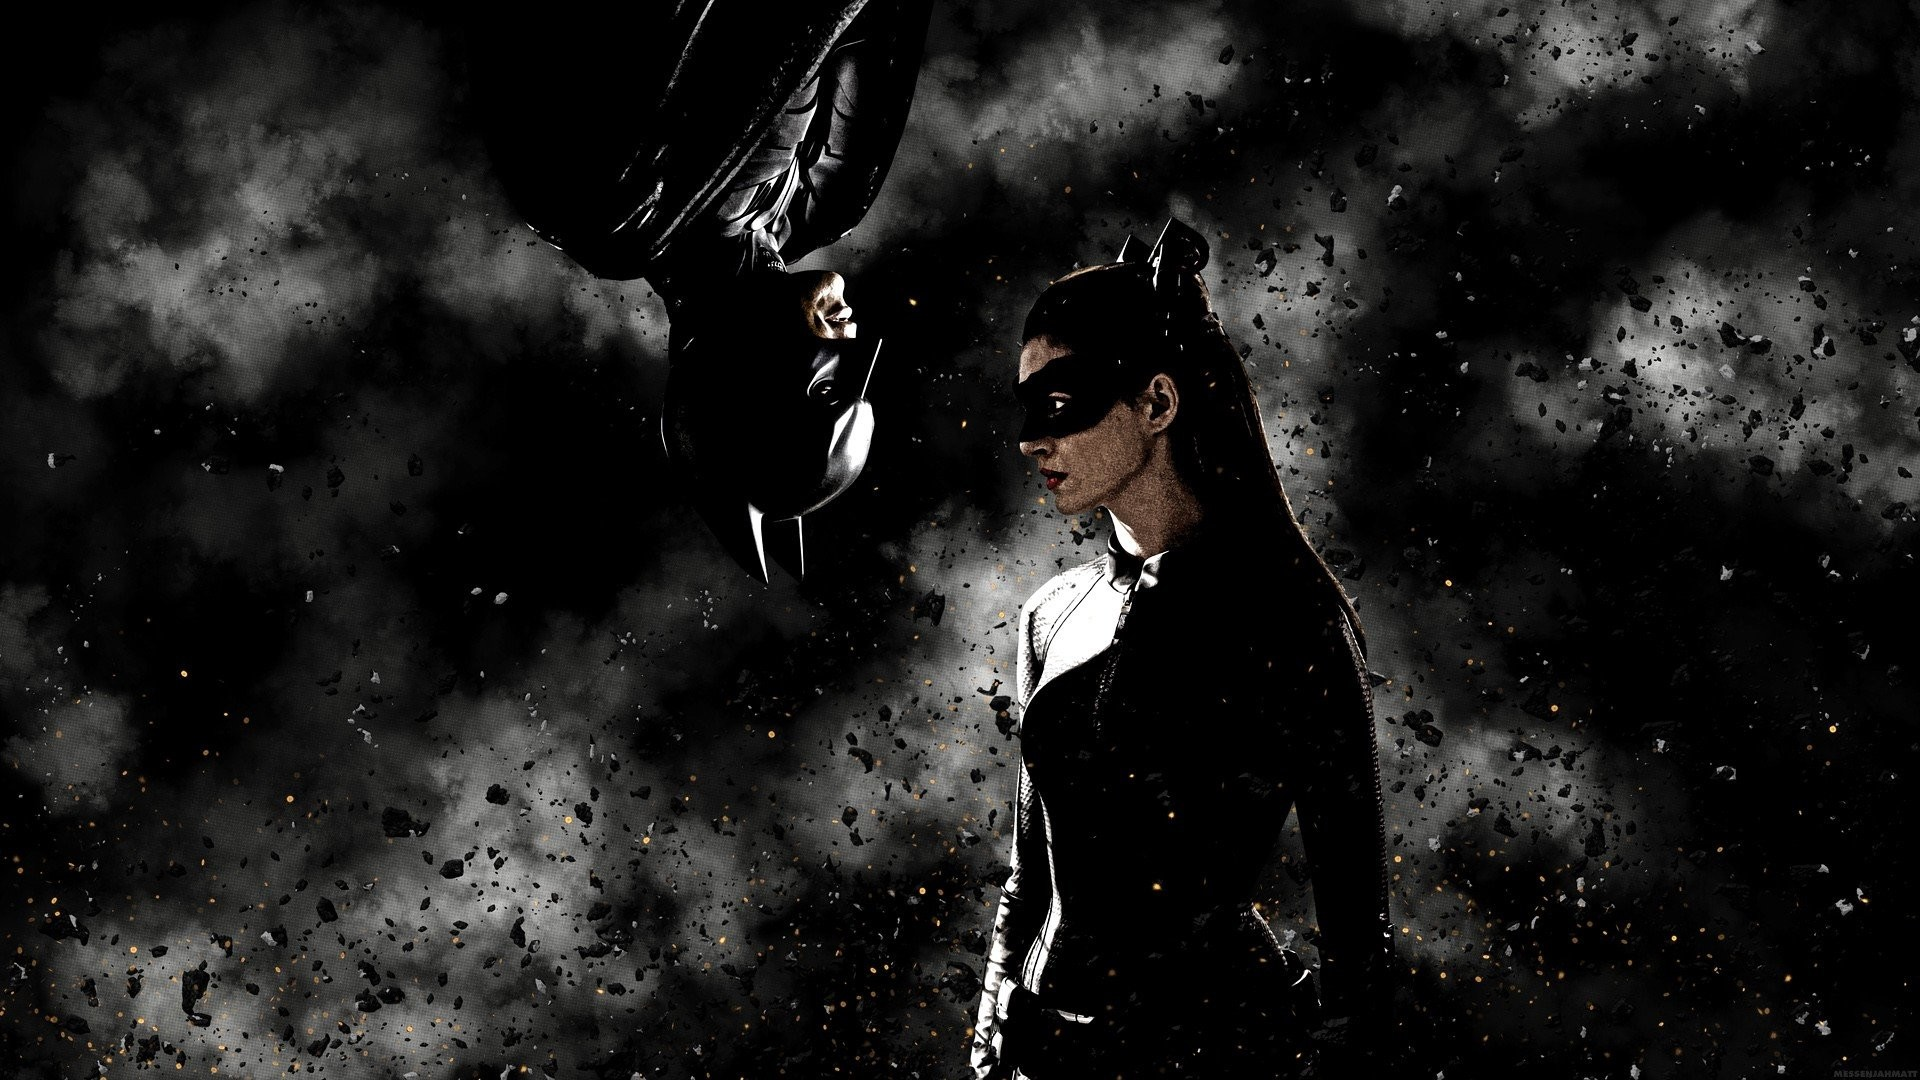 Batman HD Wallpapers p   HD Wallpapers   Pinterest   Hd batman wallpaper,  Wallpaper and Wallpaper free download